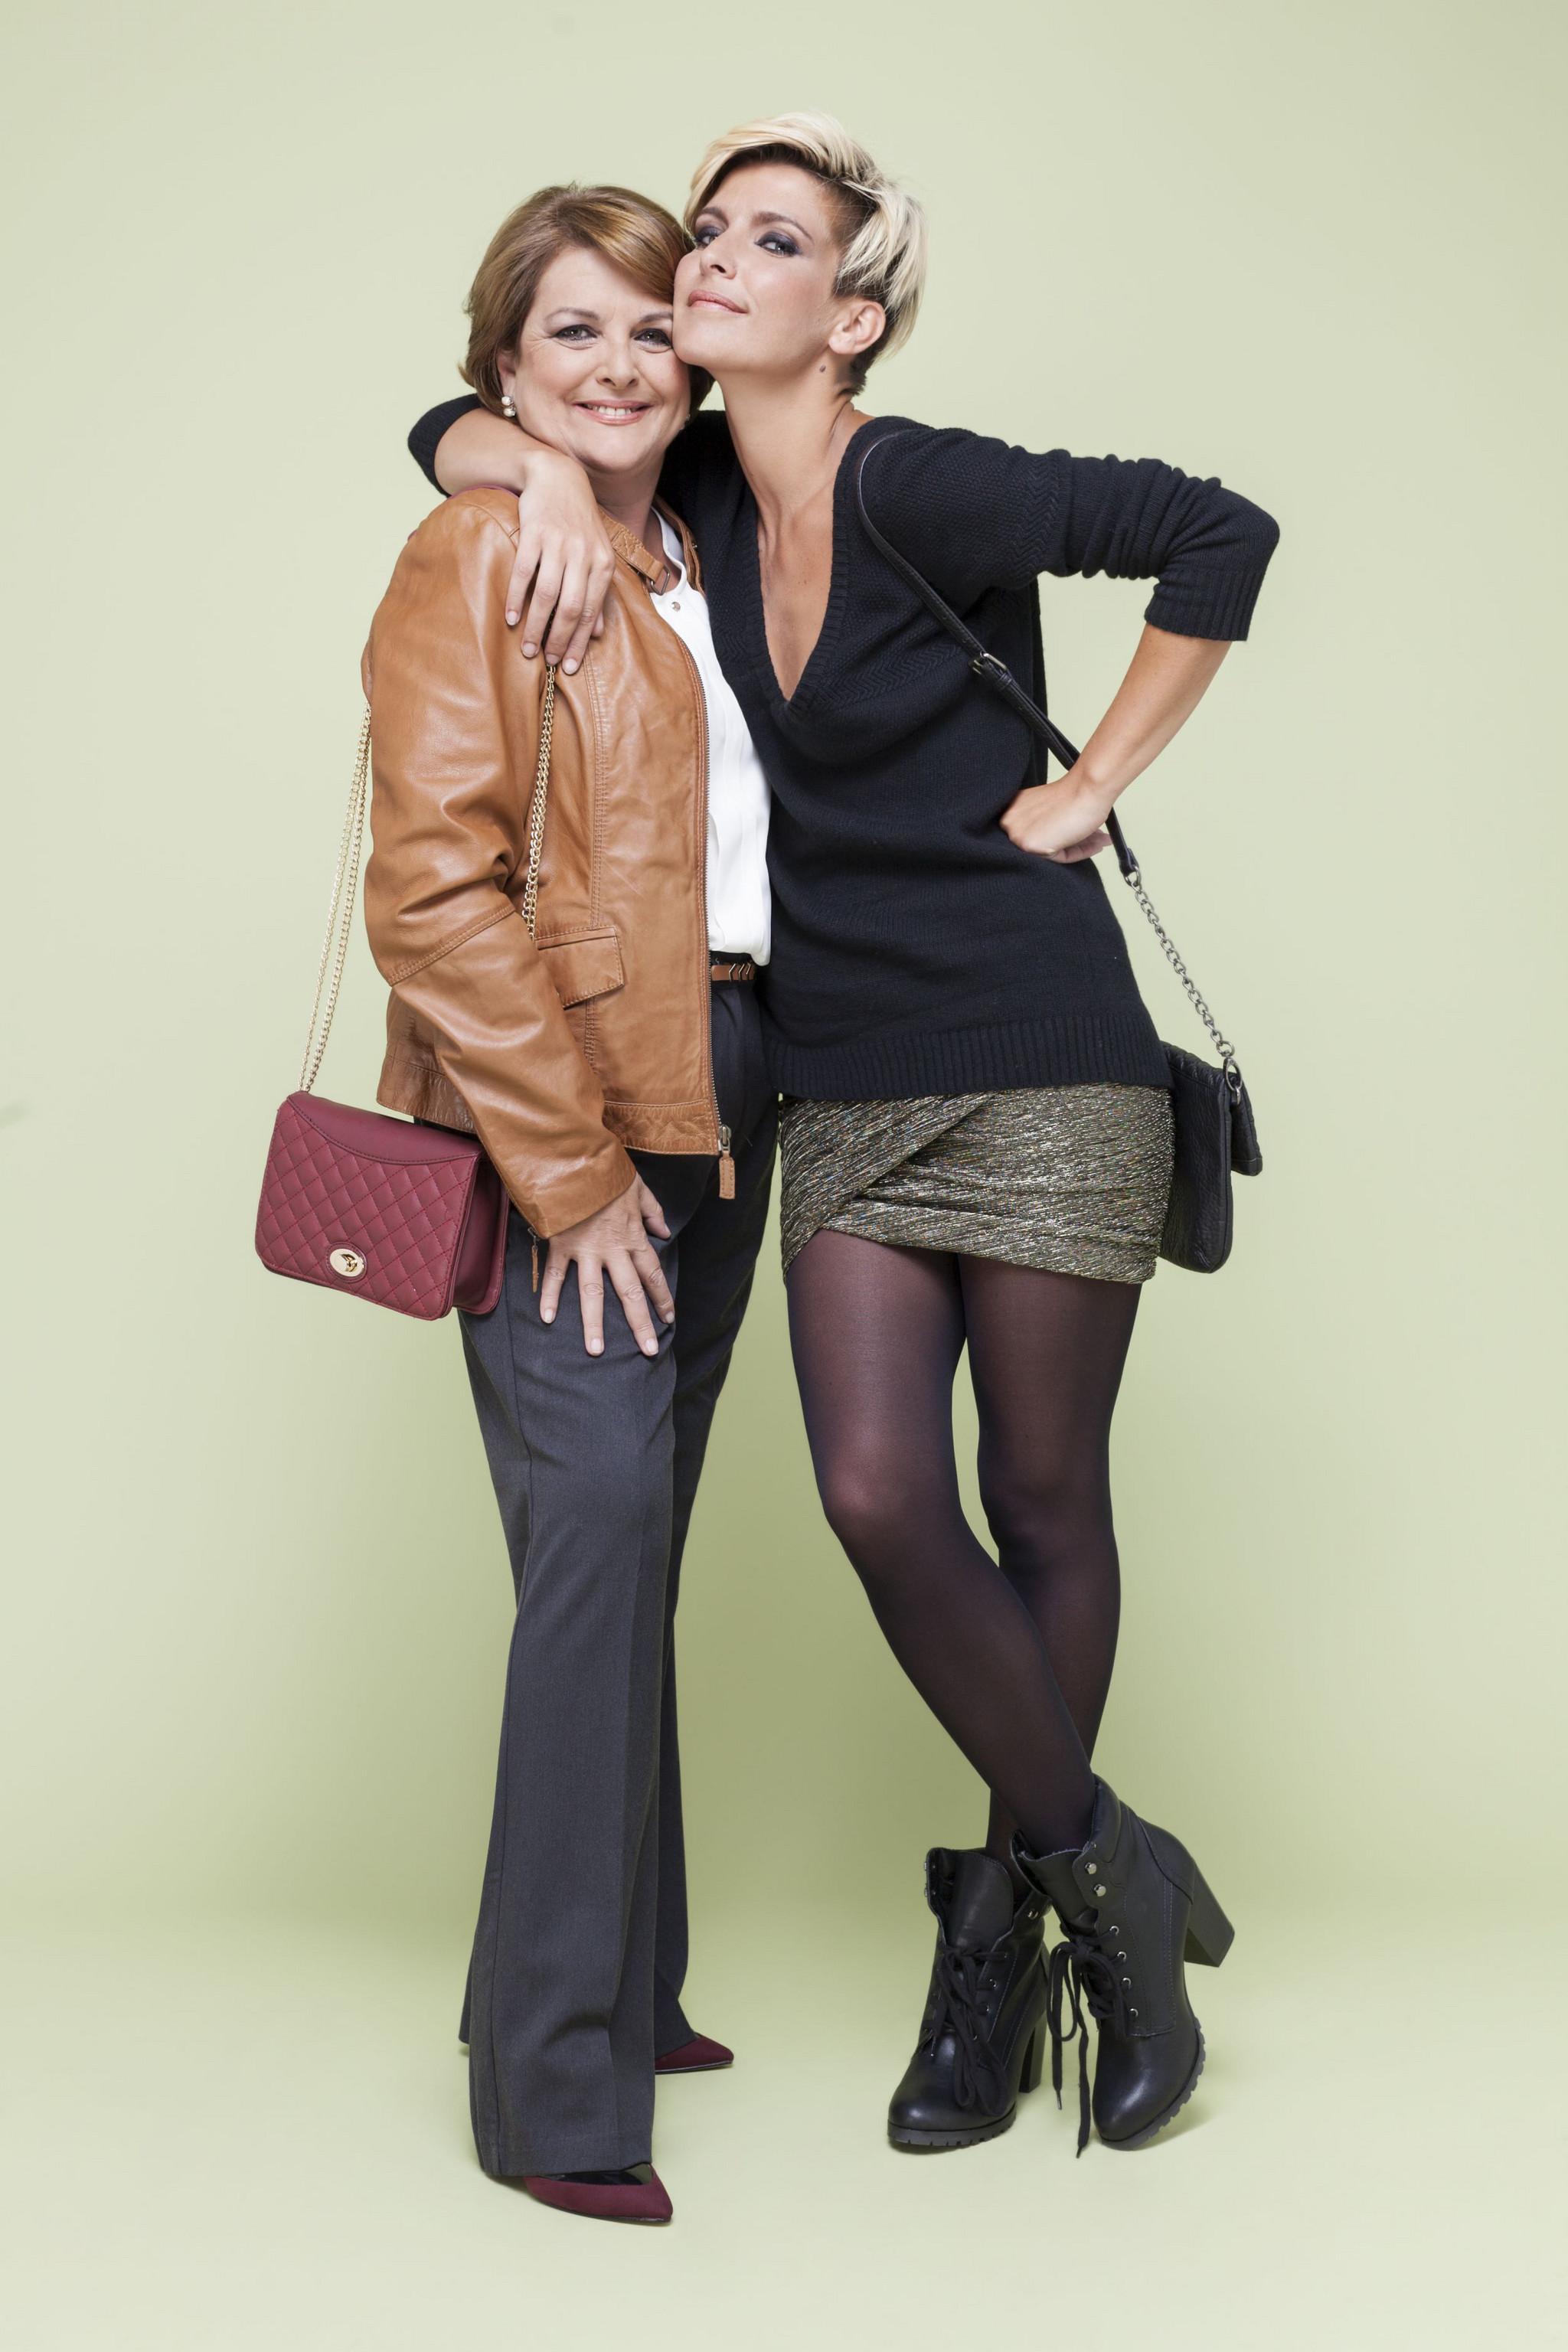 La Redoute_Inês e Luisa Castel-Branco_1.jpg